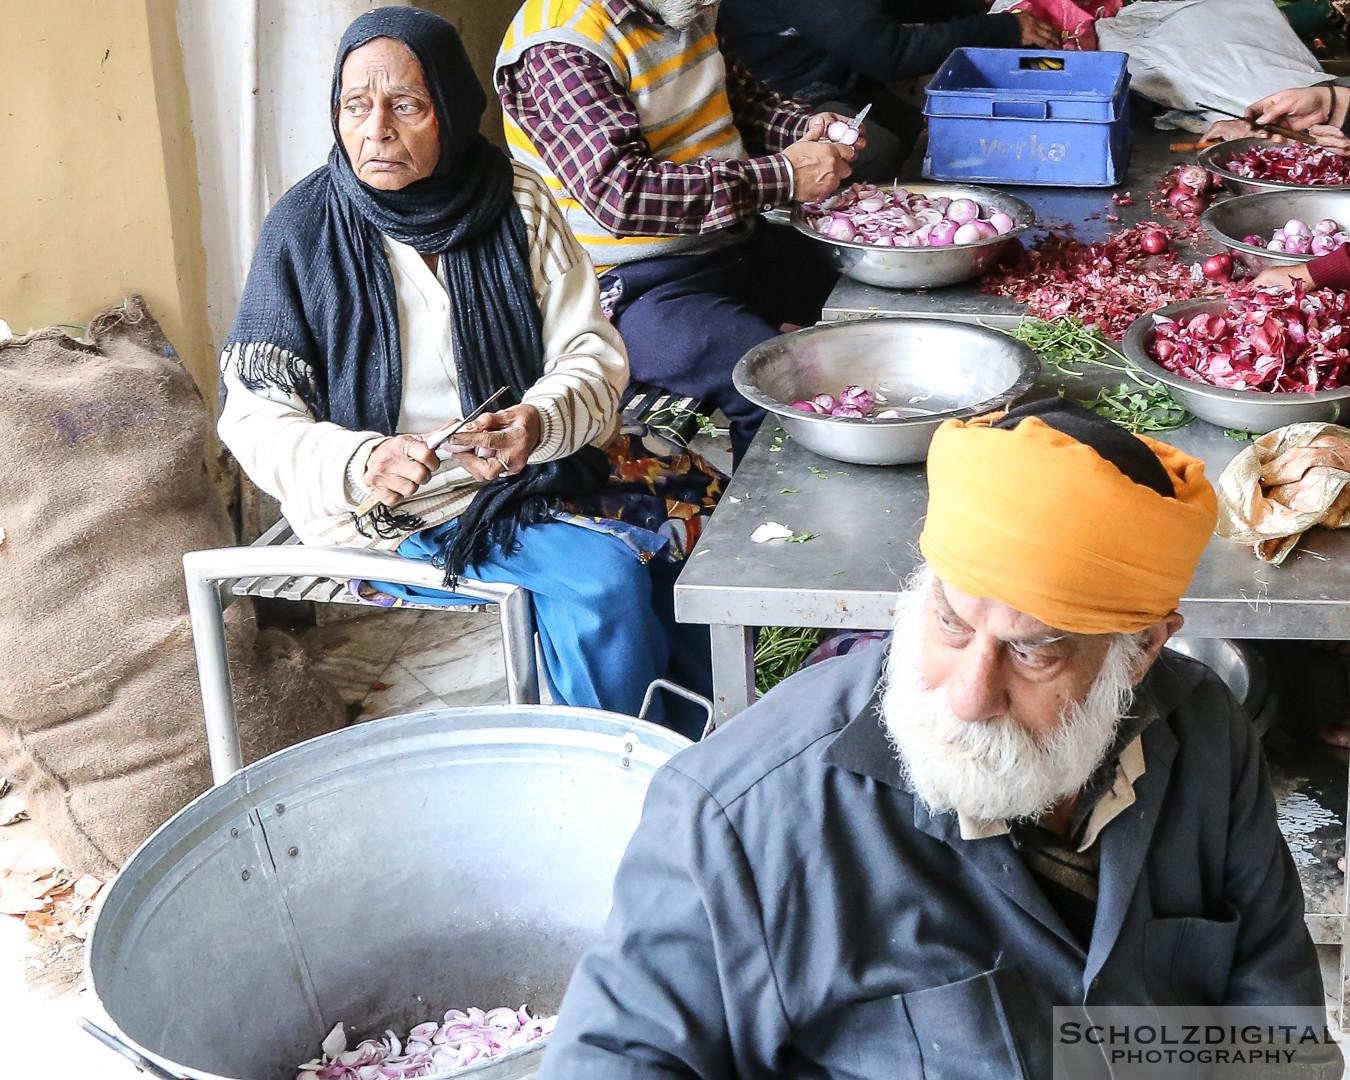 Küche im Gurudwara Bangla Sahib, Sikh-Tempel, New Delhi, Indien, India